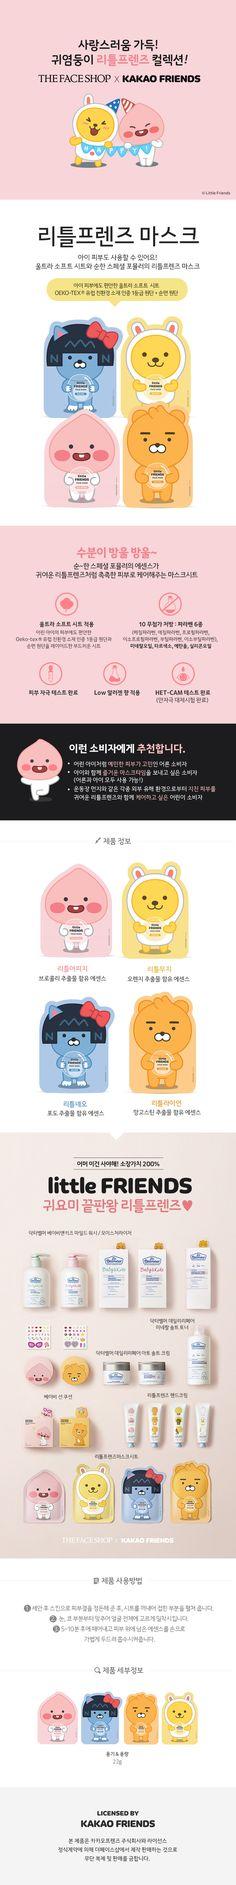 Kakao Friends, Event Banner, Typo, Promotion, Korea, Web Design, Content, Cartoon, Detail